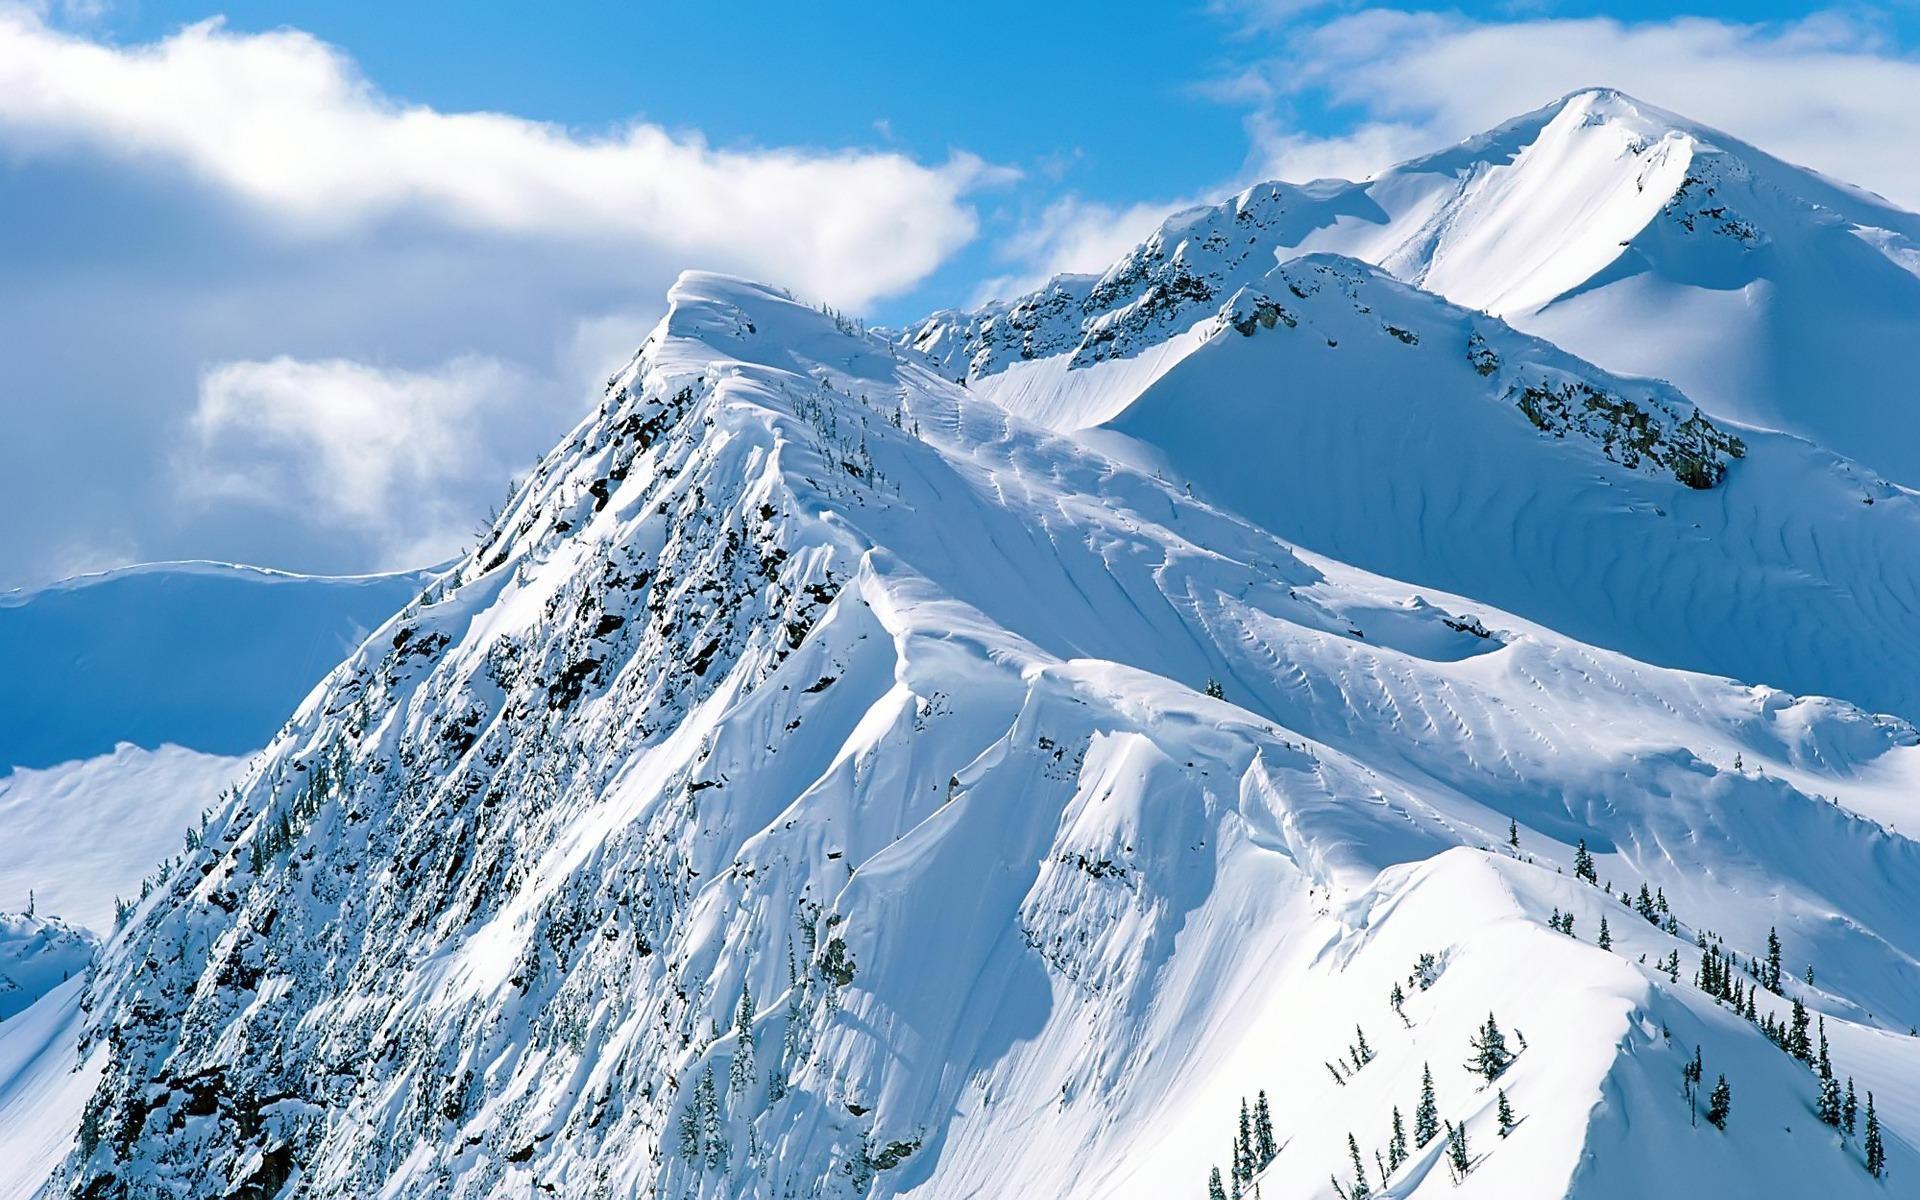 Nanda Parbat Trip [Mission JL-Martian M., Jade, Green Arrow] Hd-wallpapers-snow-mountain-desktop-pcmac-wallpaper-1920x1200-wallpaper